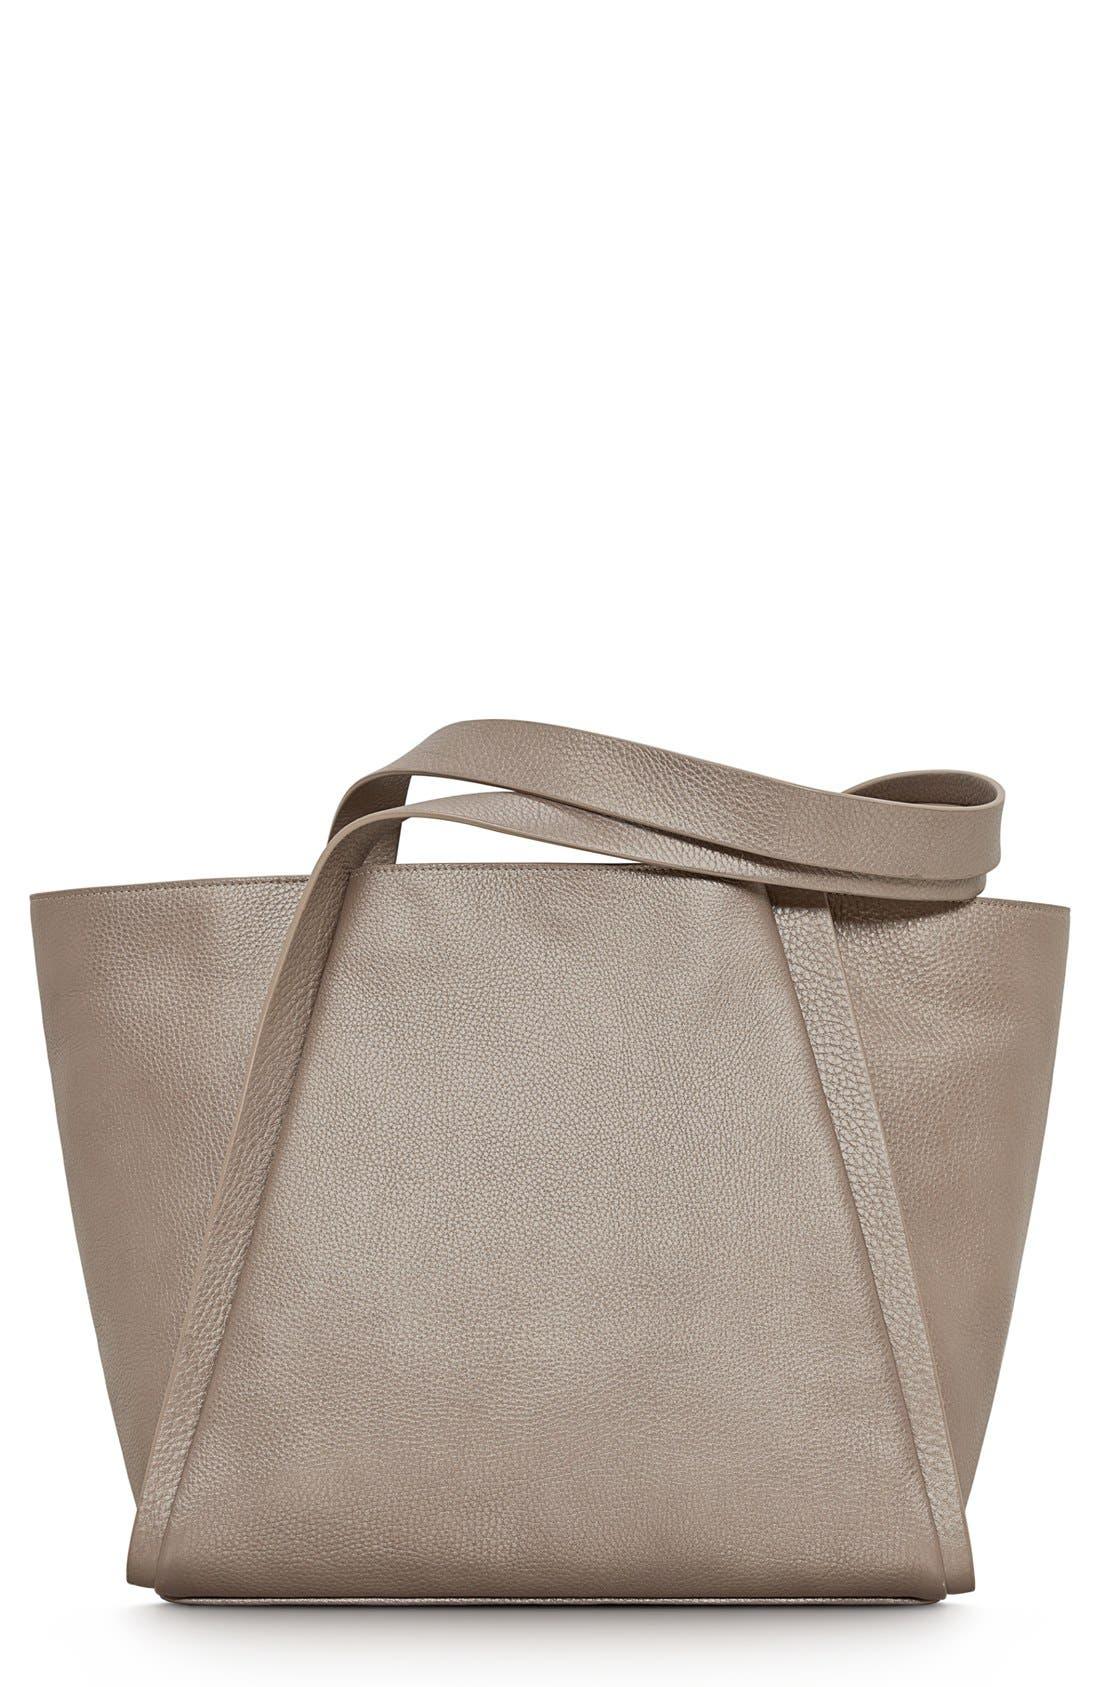 Alternate Image 1 Selected - Akris 'Medium Alex' Metallic Leather Shopper